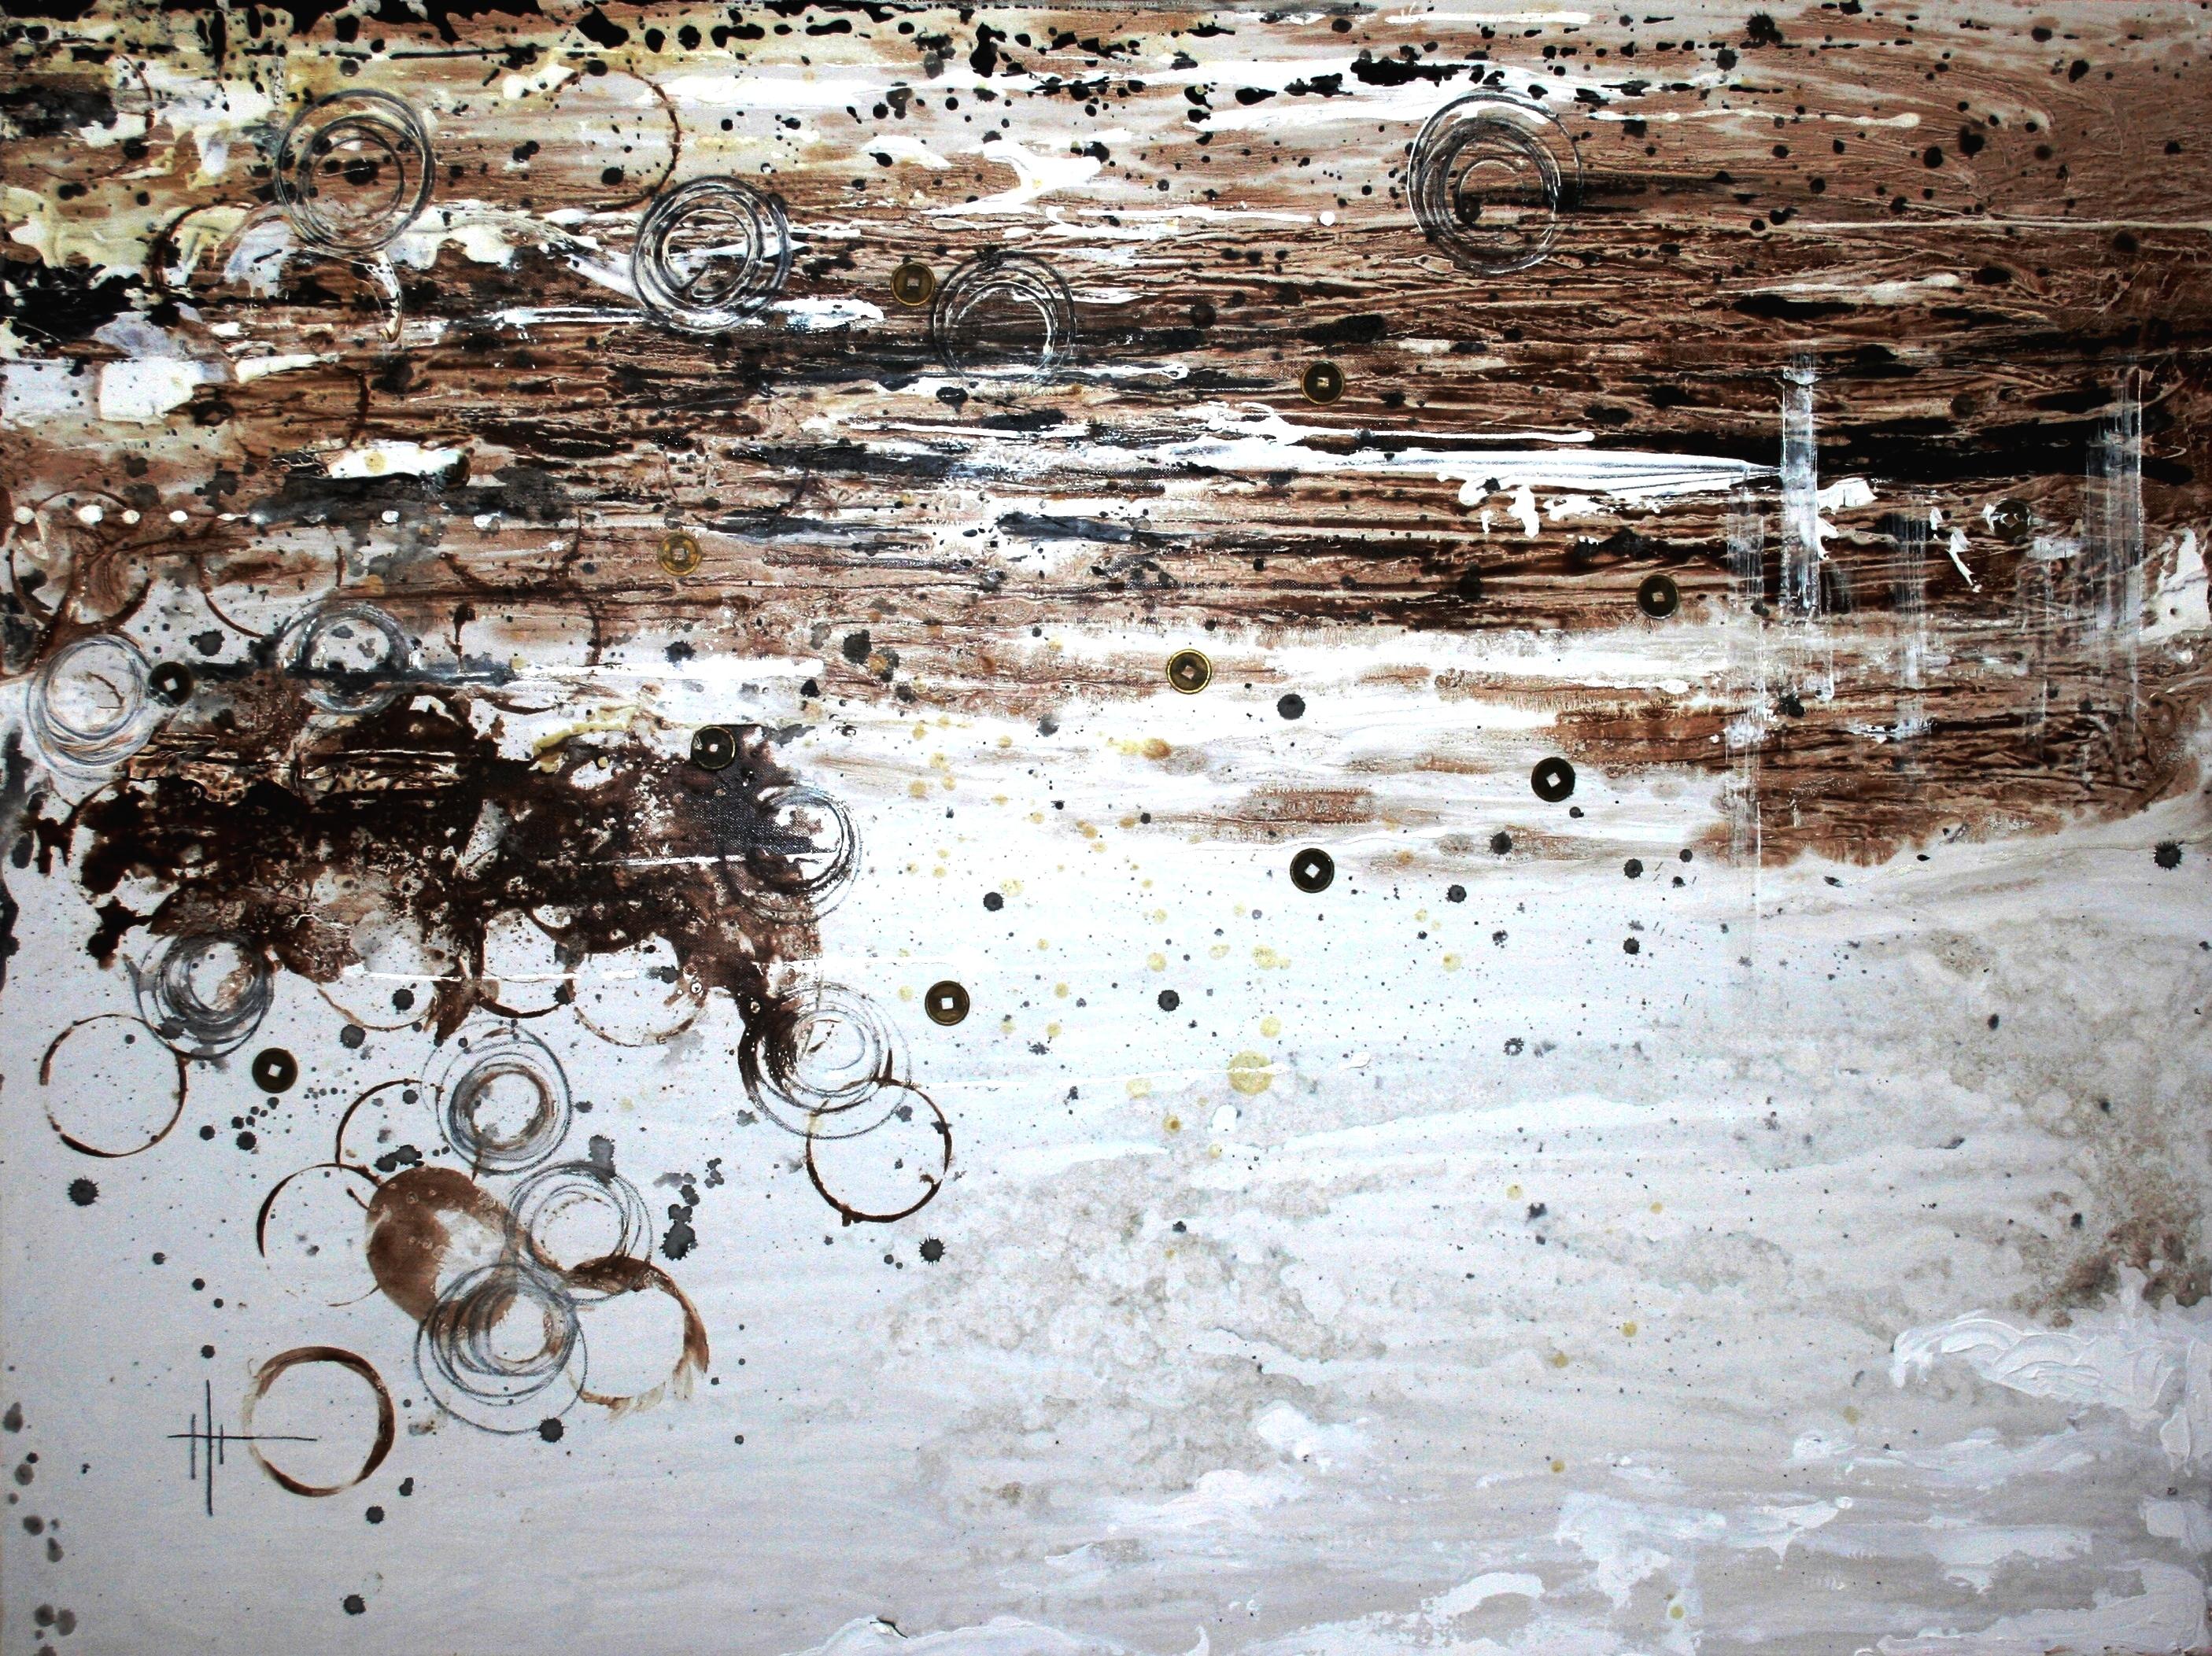 samantha clark waters artist australian gold coast abstract neutral